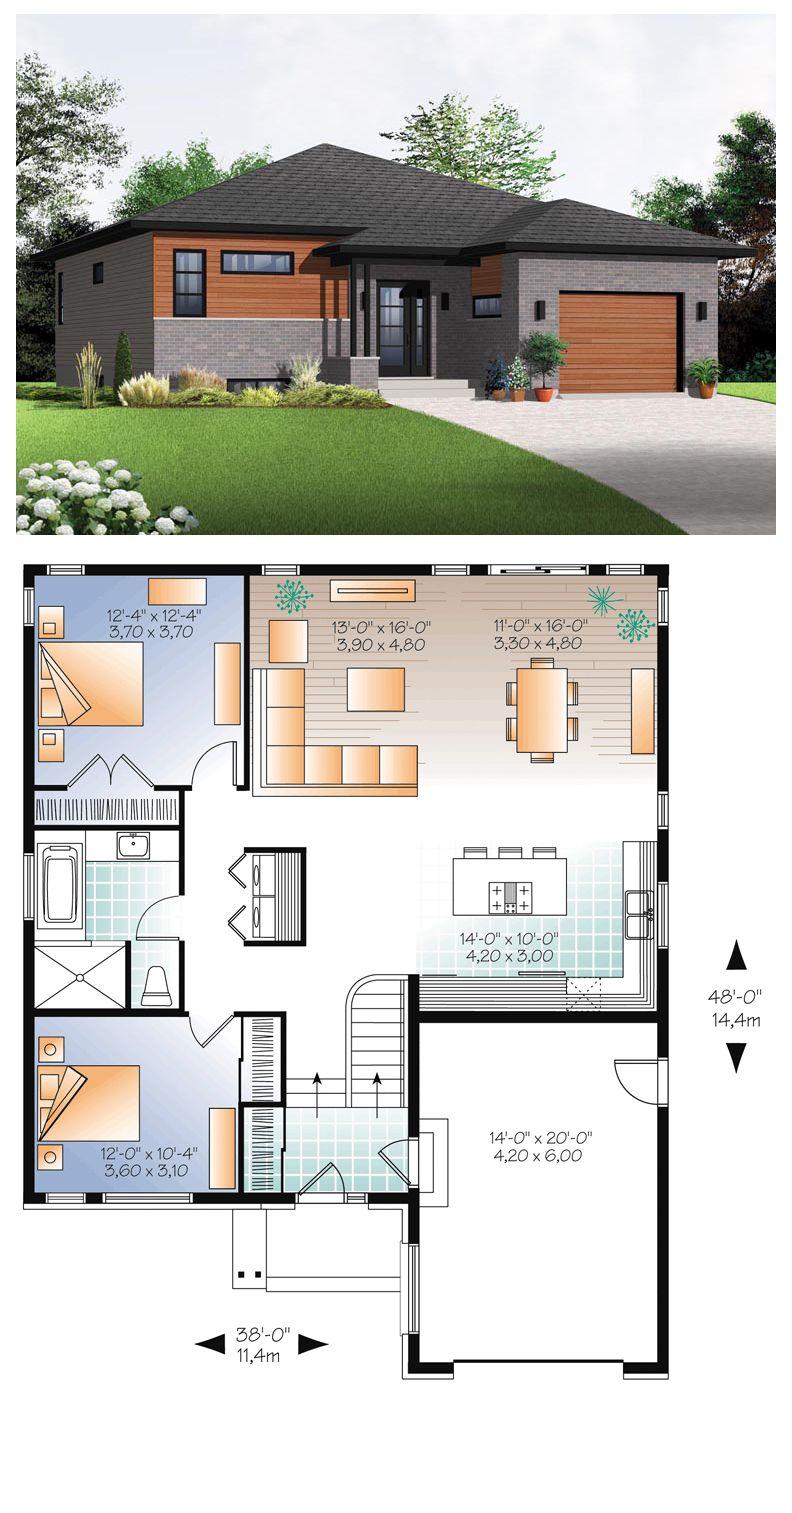 Modern Style House Plan 76356 With 2 Bed 1 Bath 1 Car Garage Modern Style House Plans Contemporary House Plans Modern House Plans